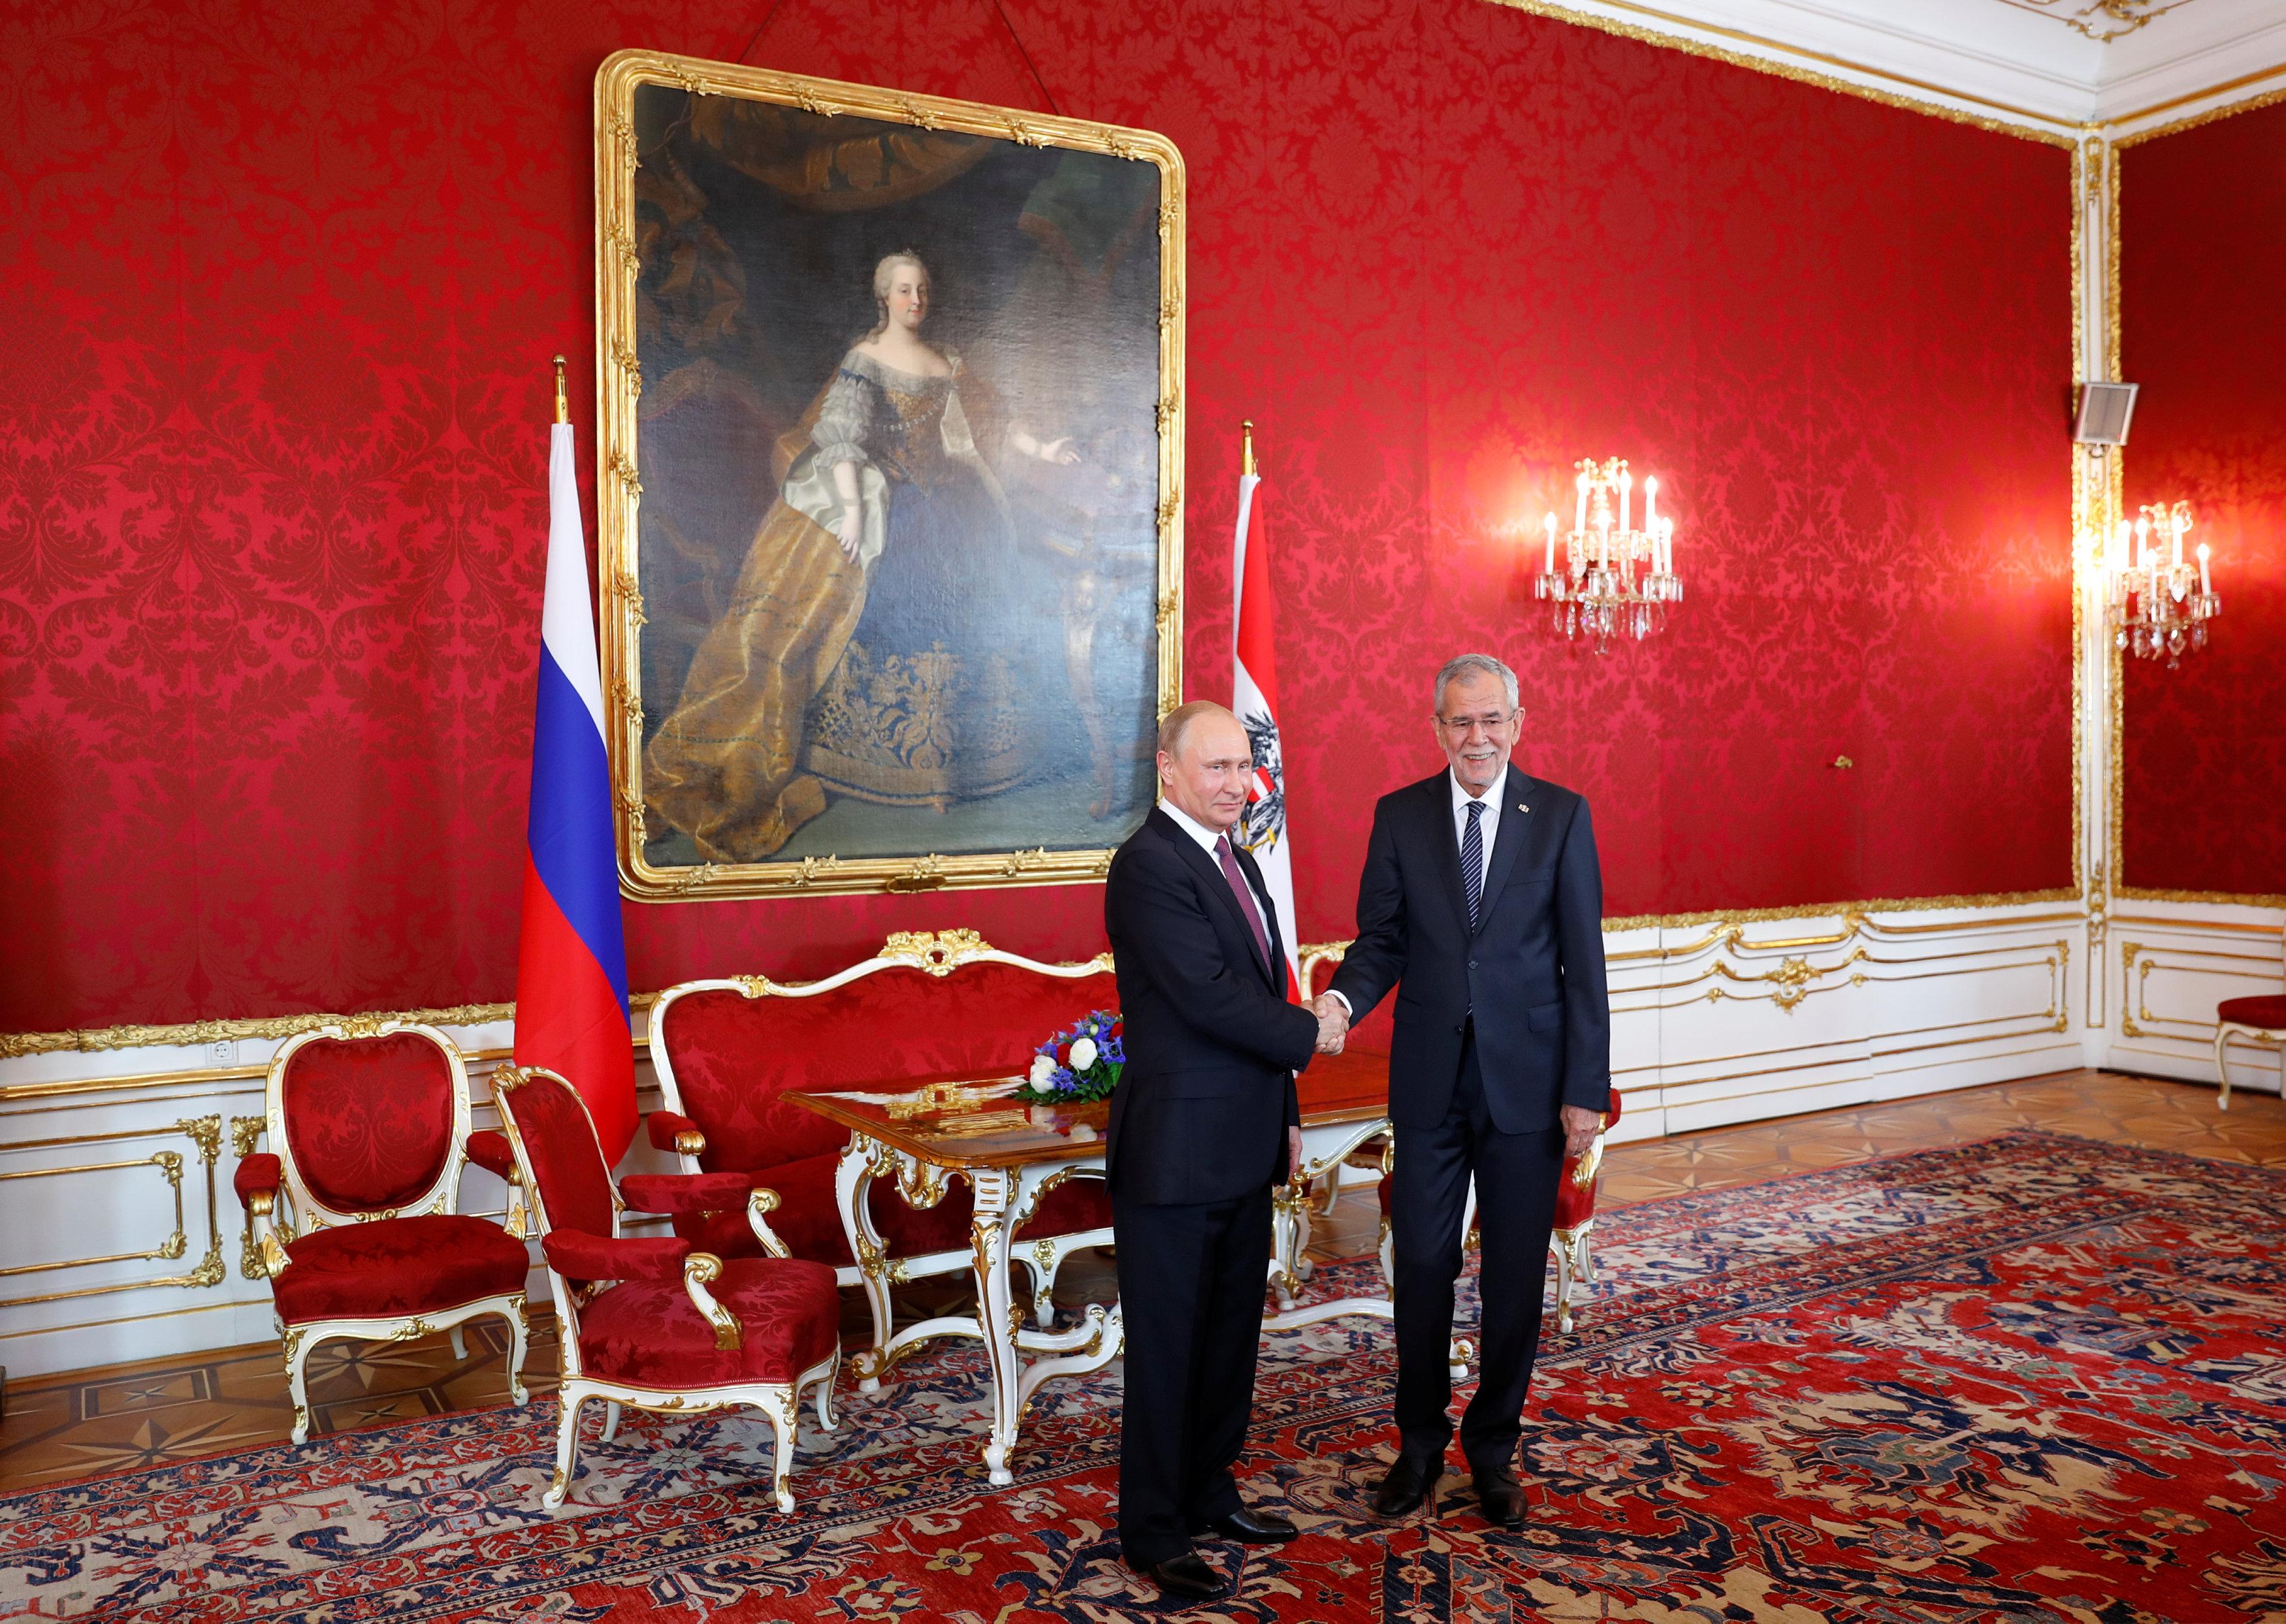 Russia's President Vladimir Putin visits Austria